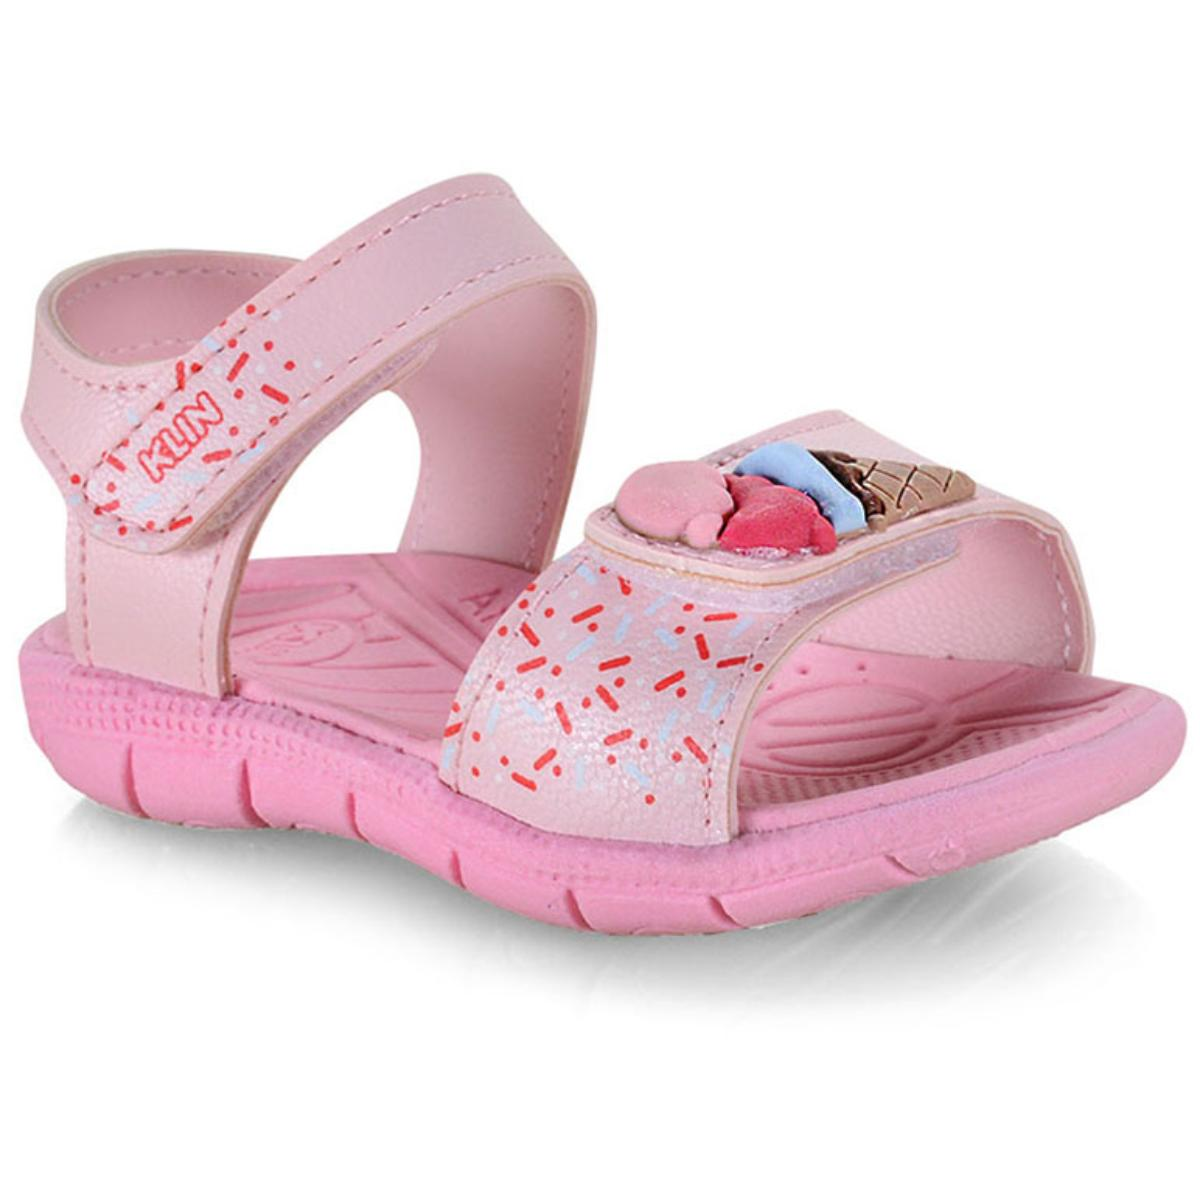 Sandália Fem Infantil Klin 711.108 Rosa Claro